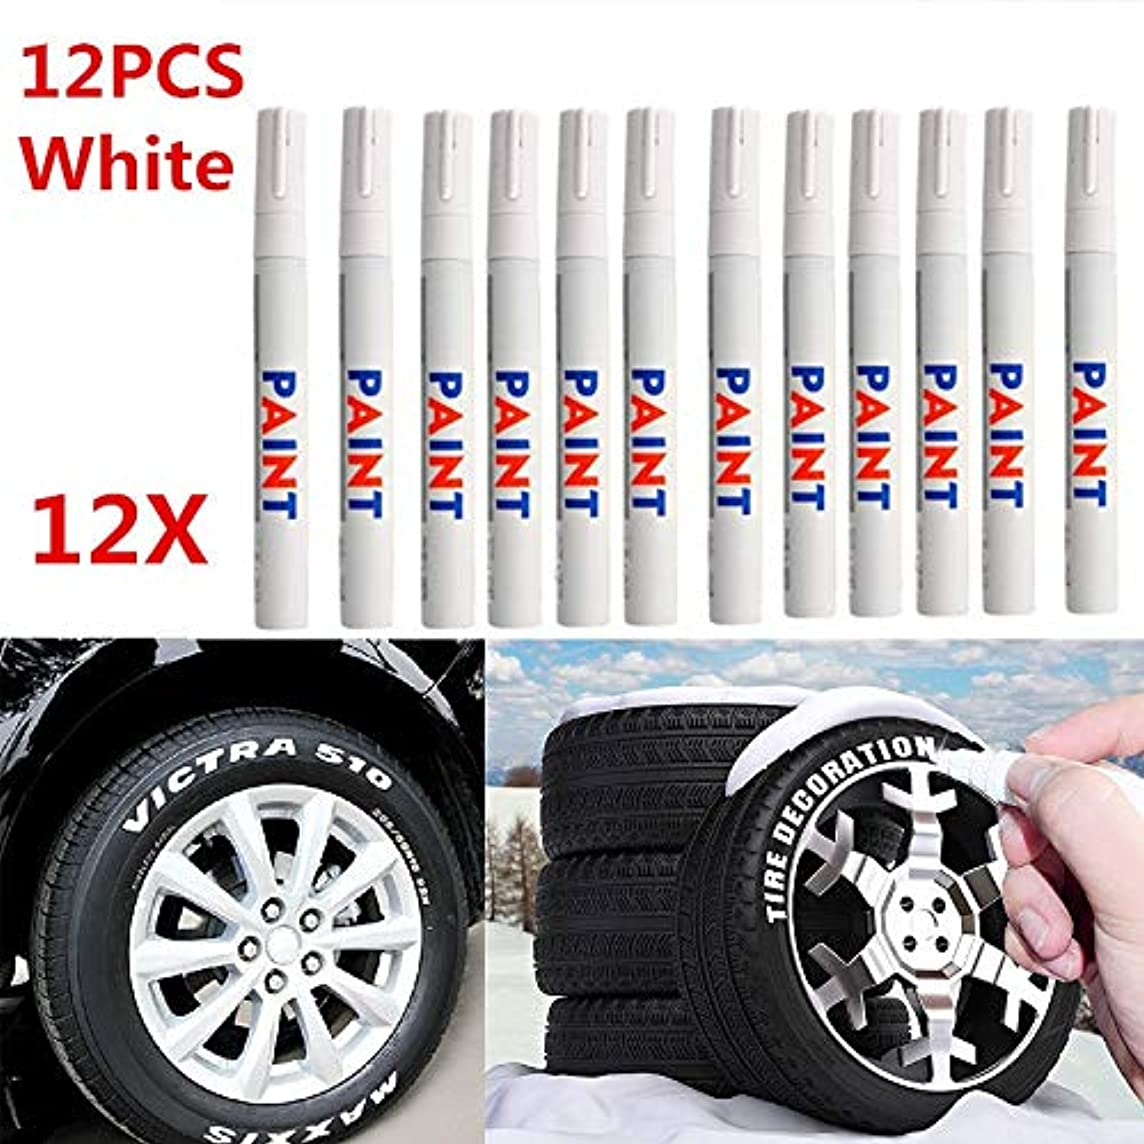 Carvicto - Tire Repair Tools 12pcs White Waterproof Permanent Car Tyre Tire Tread Paint Marker Pen Tire Pen Motorcycle